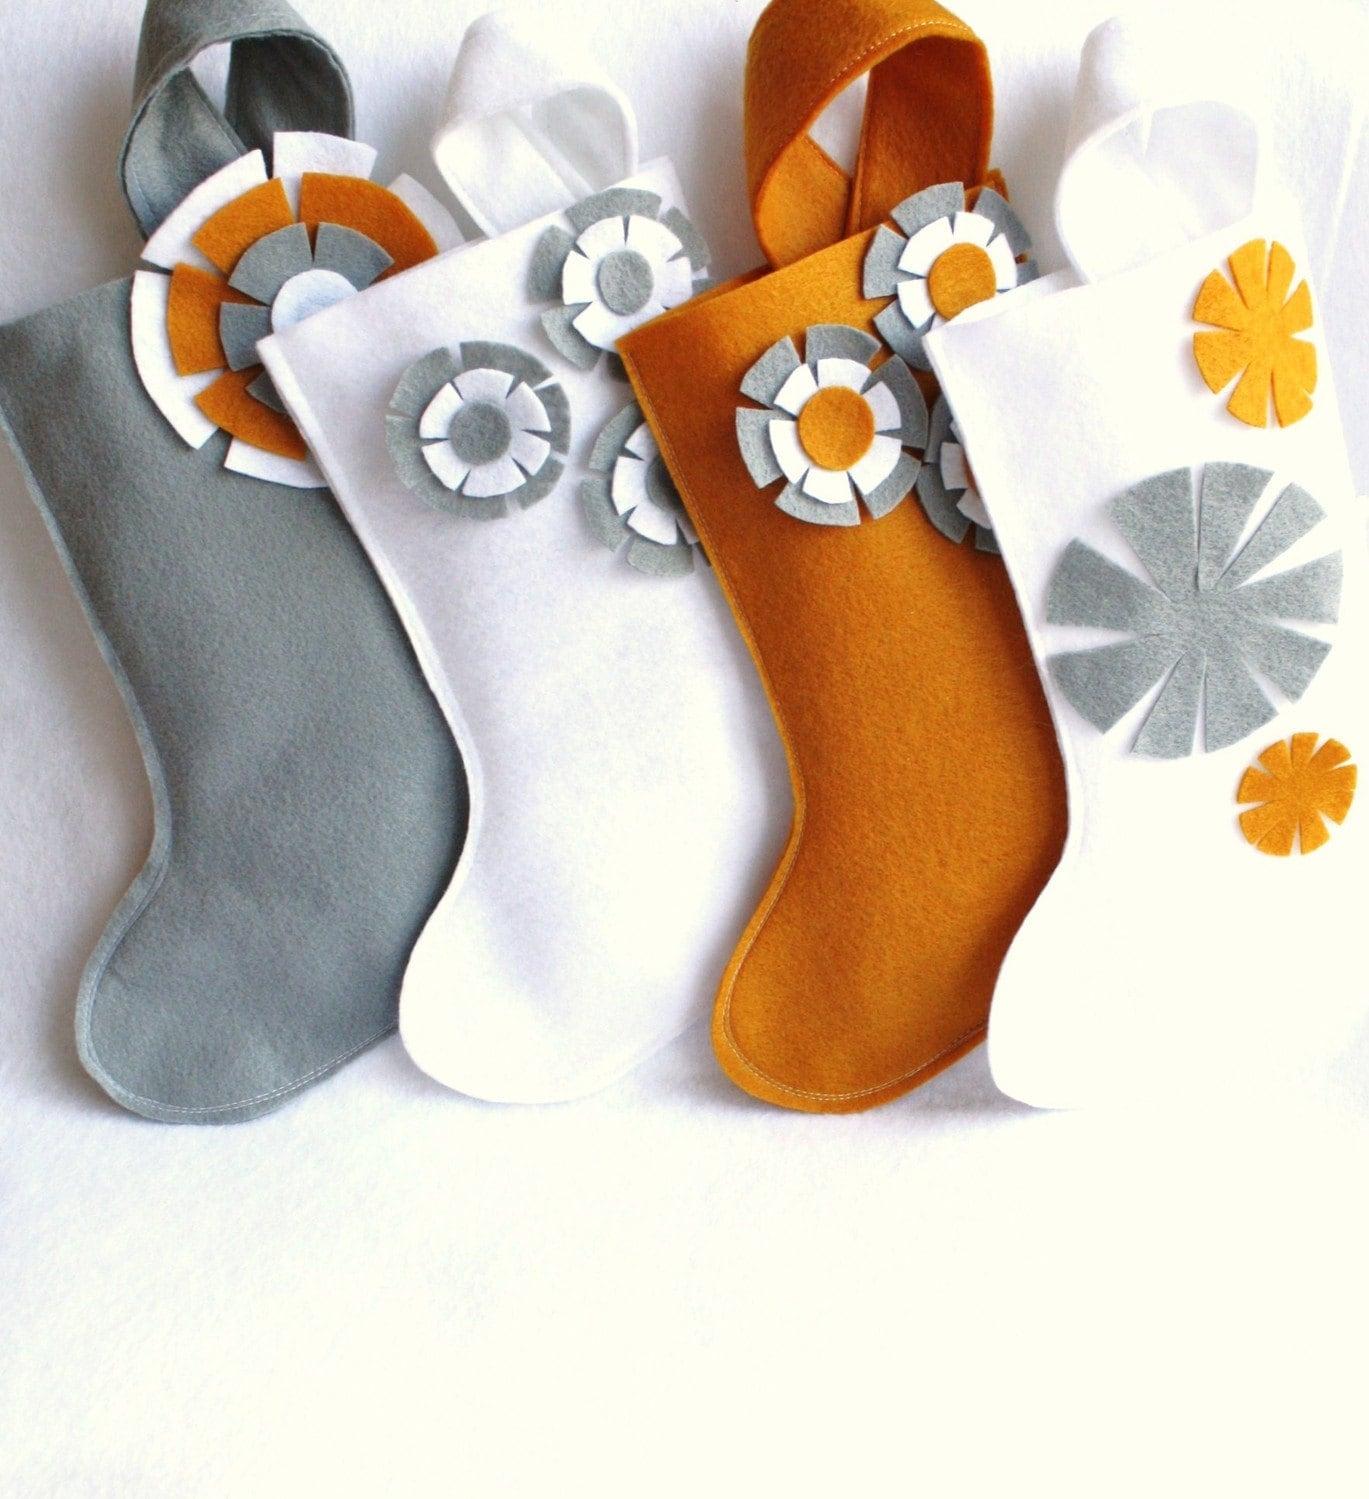 Christmas stocking in gray / grey , gold or white eco friendly felt